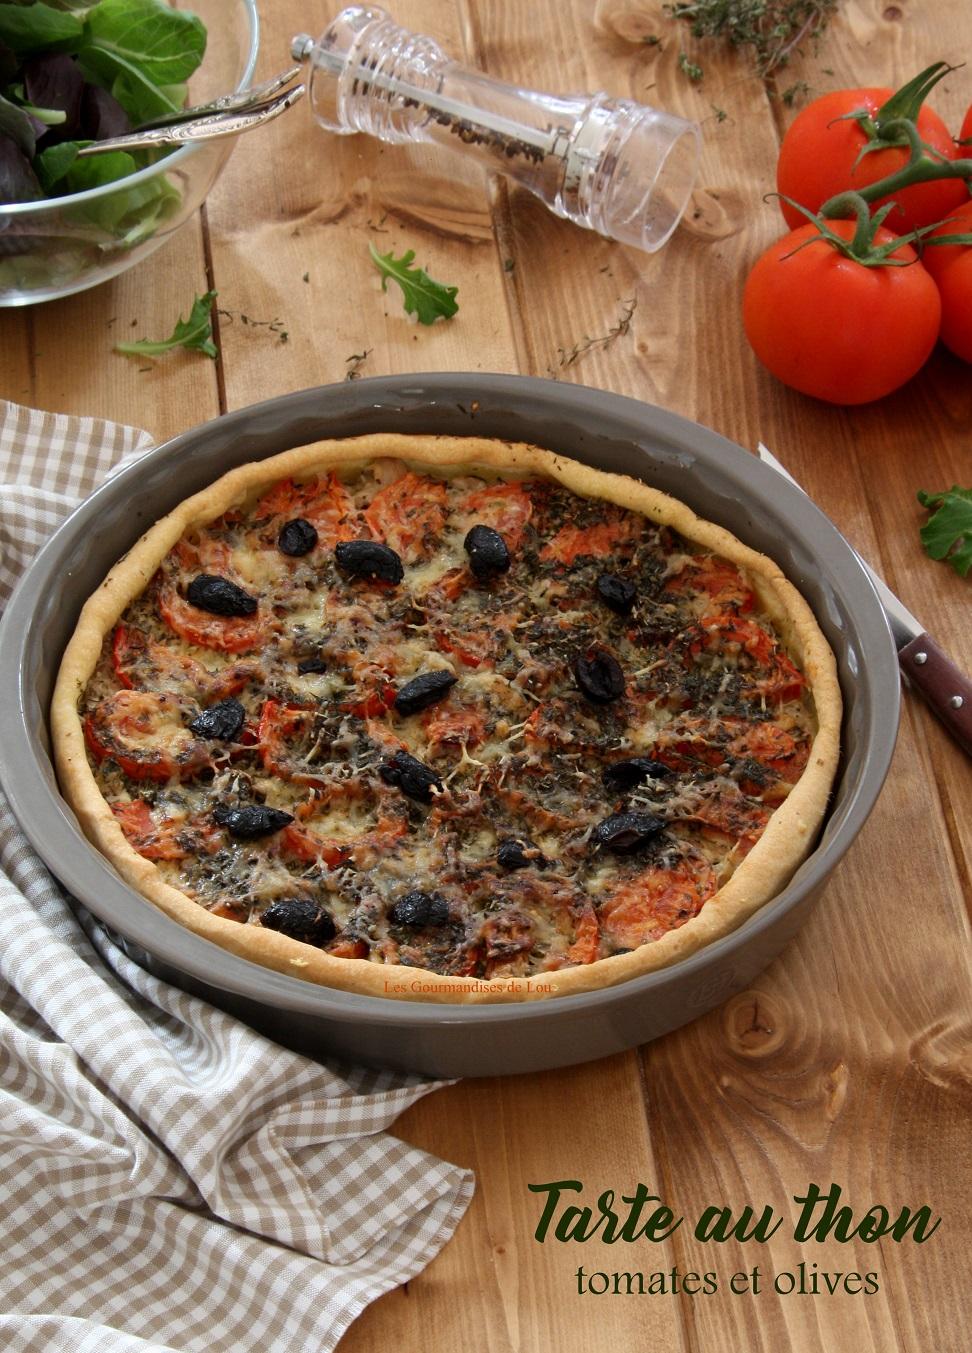 tarte-au-thon-tomates-et-olives